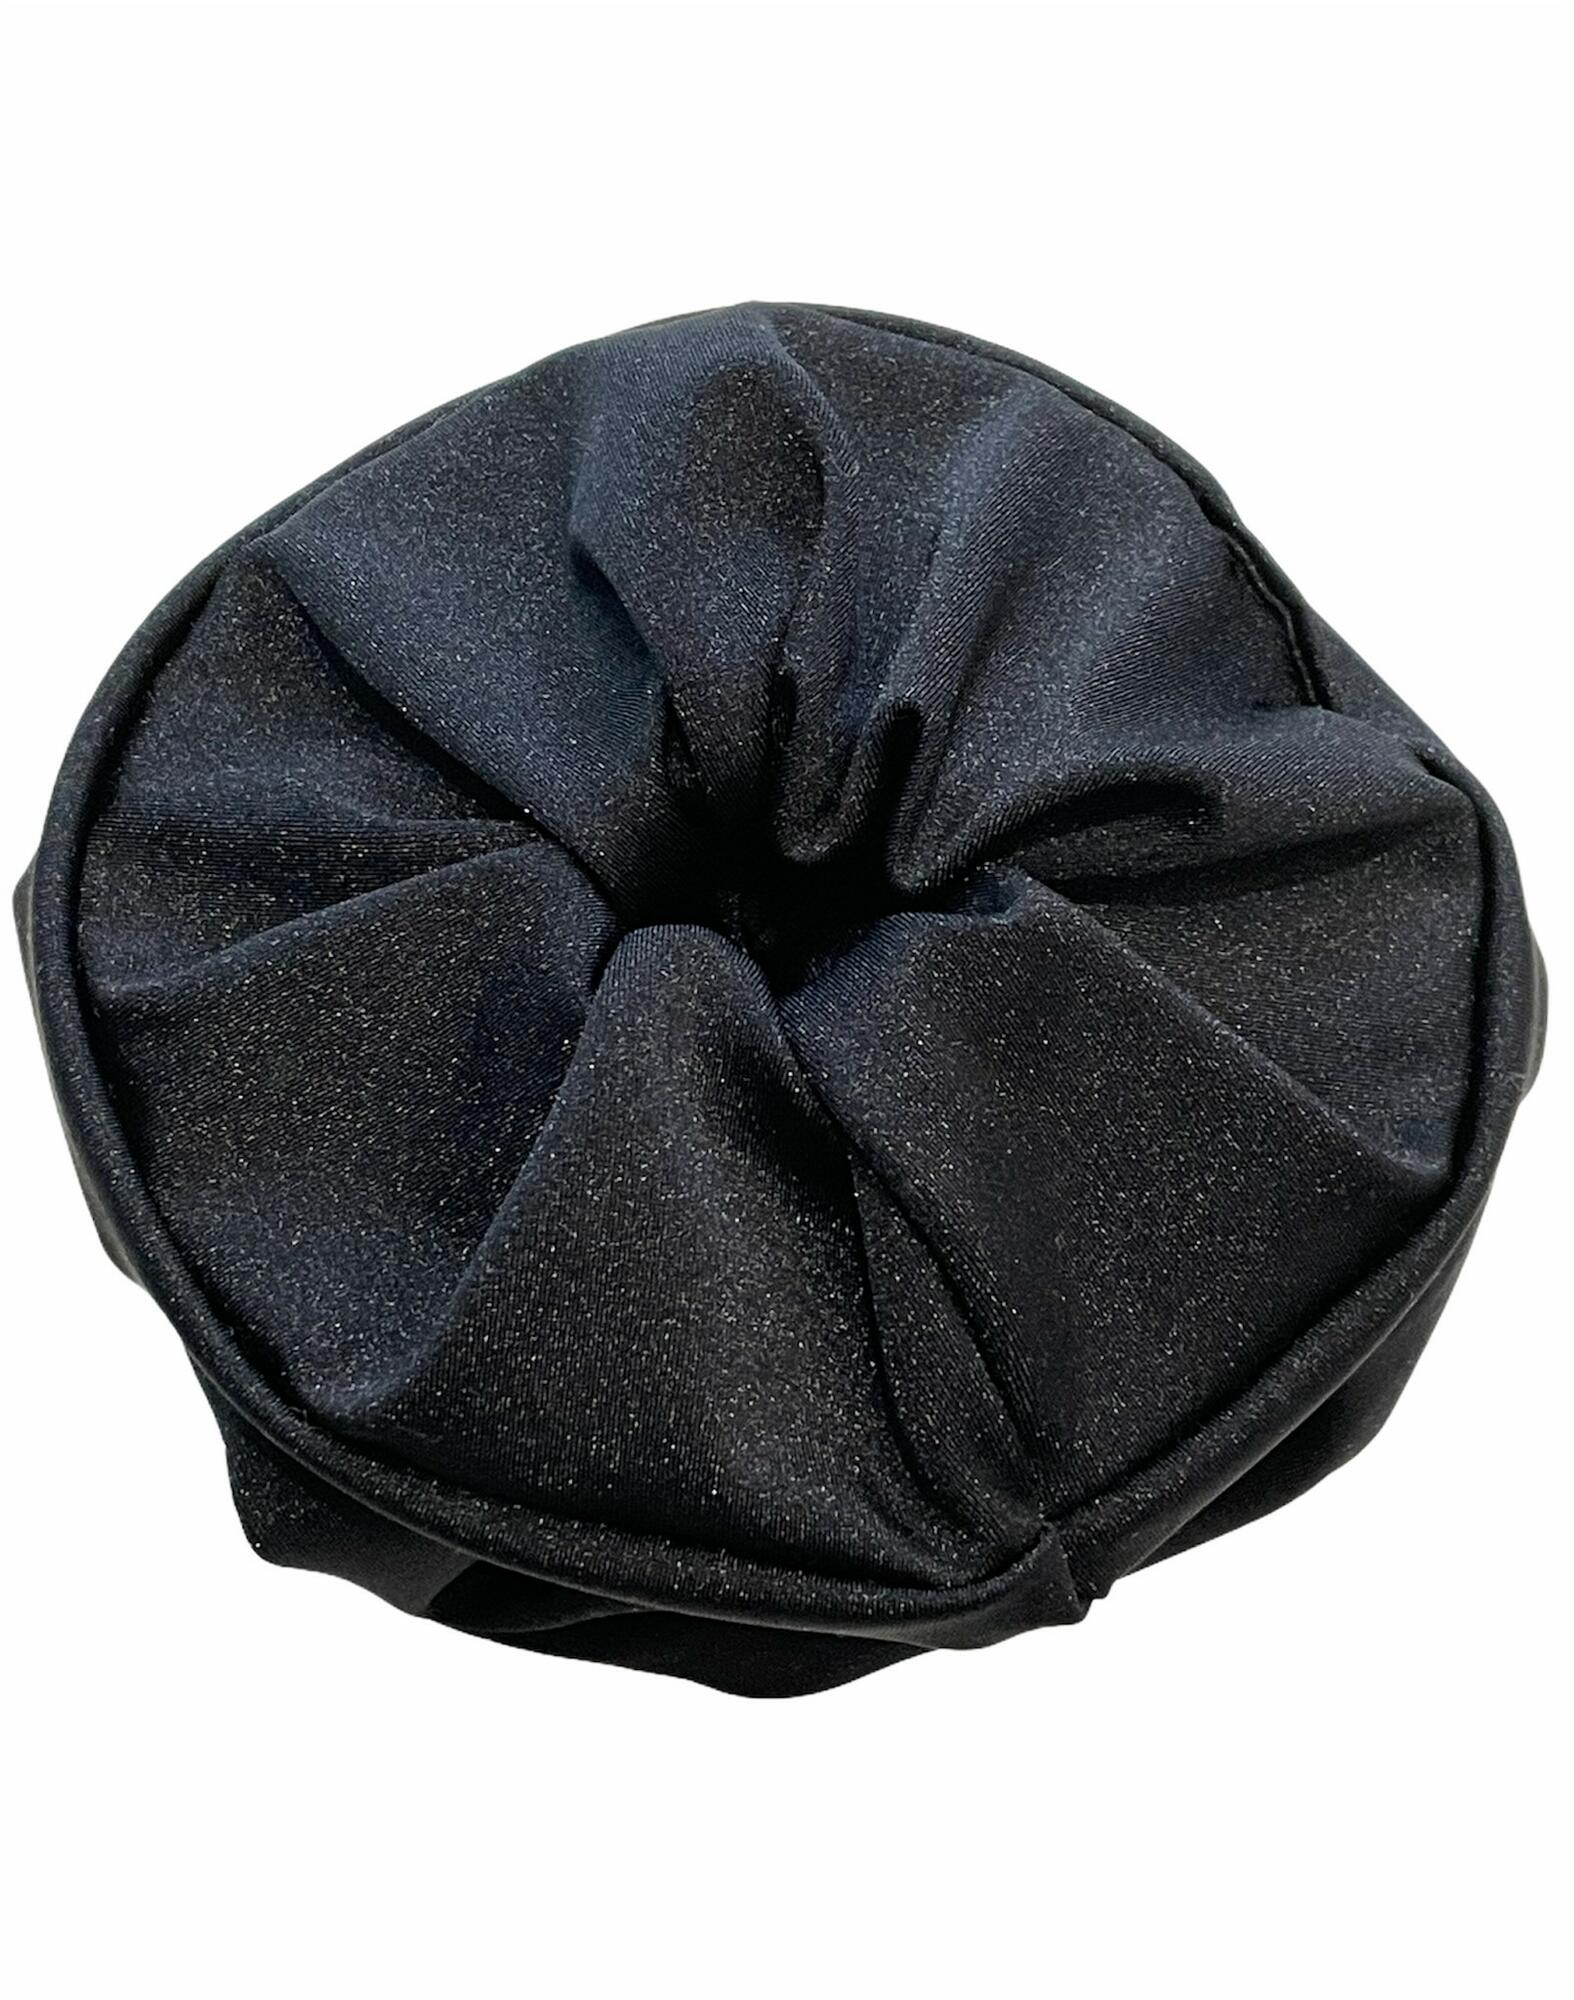 ELASTYCZNE SCRUNCHIE METEORITE BLACK - La Luna Wear   JestemSlow.pl